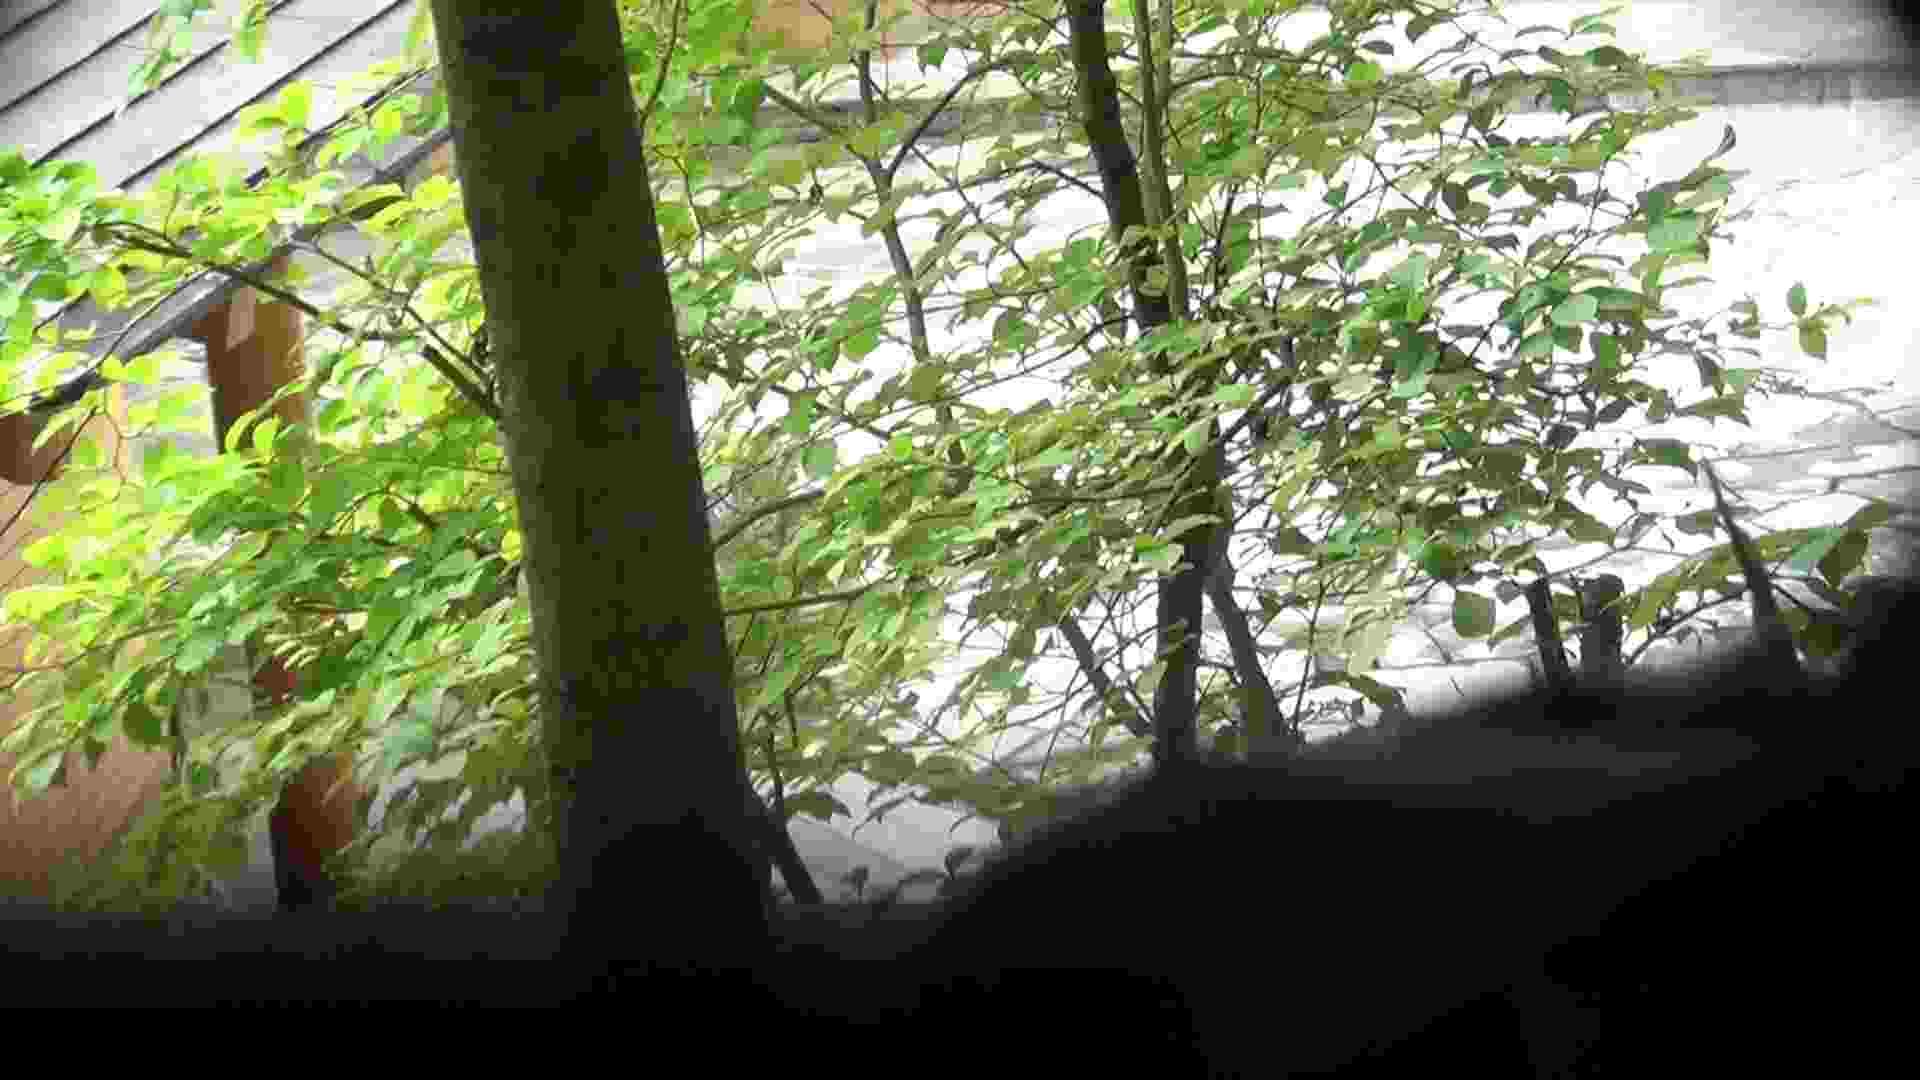 Vol.30 品のある美女 タオルと葉が憎い 高画質動画 オマンコ動画キャプチャ 78画像 51